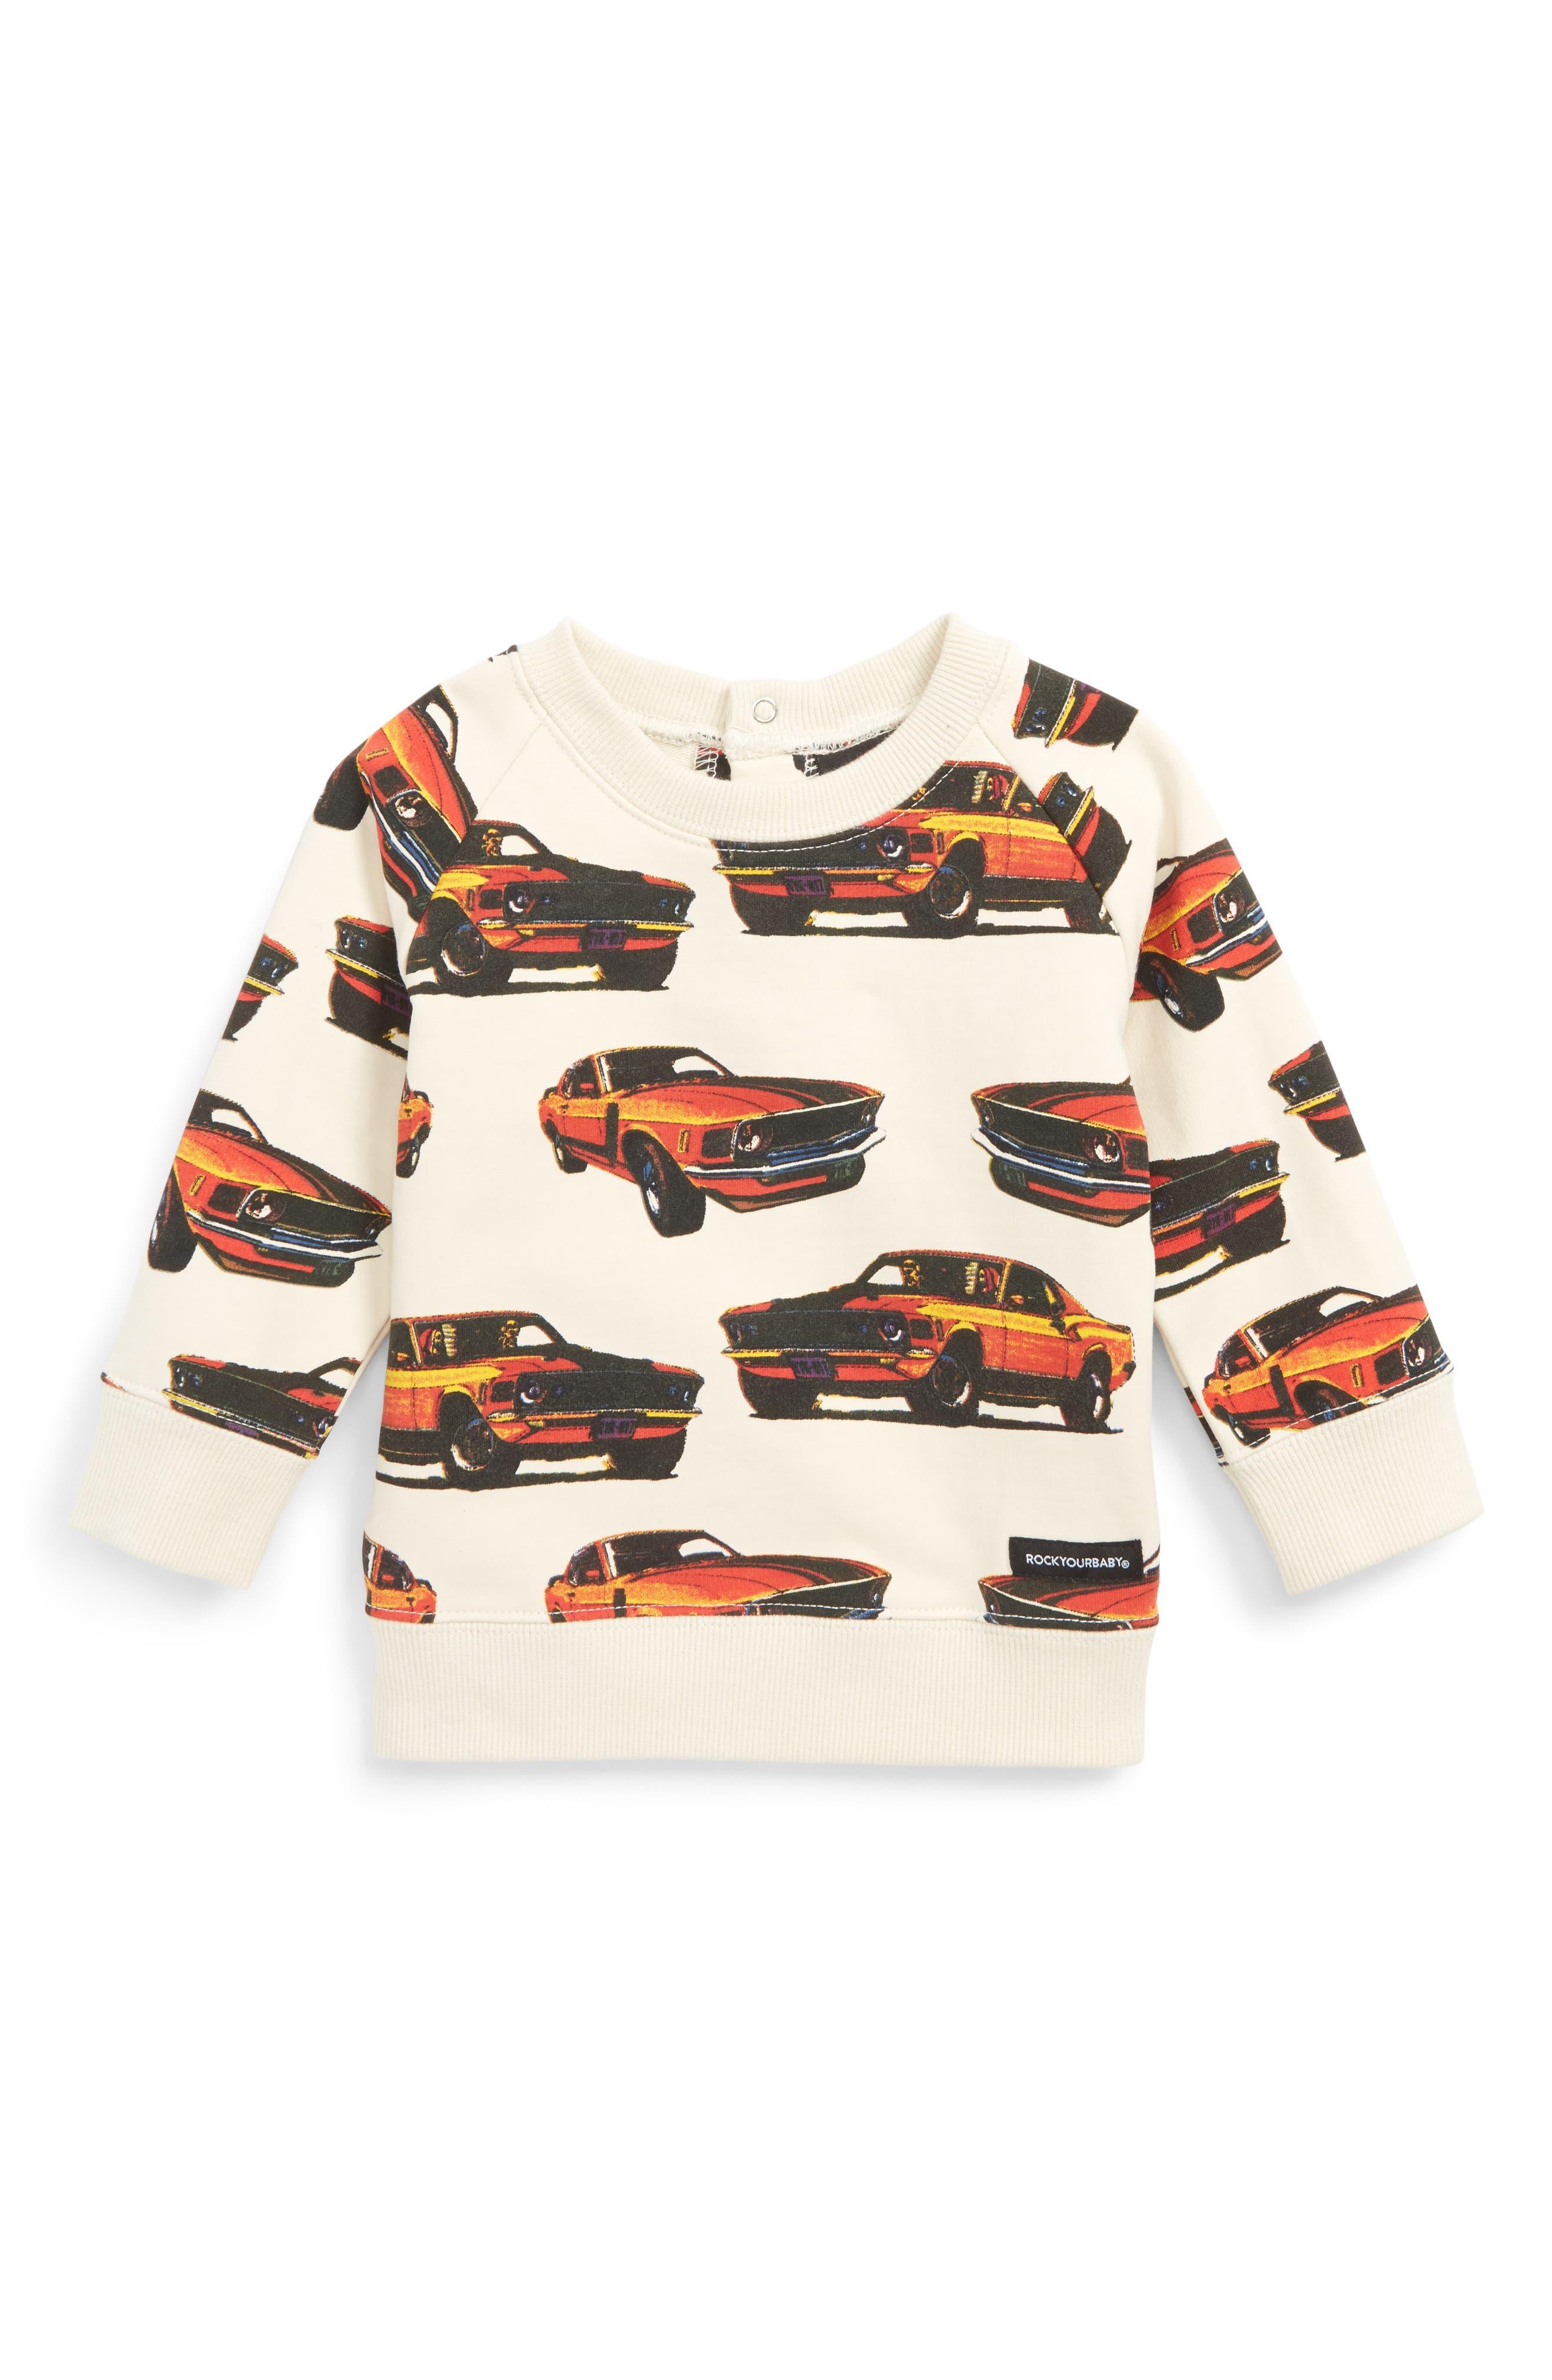 Eat My Dust Sweatshirt,                             Main thumbnail 1, color,                             900